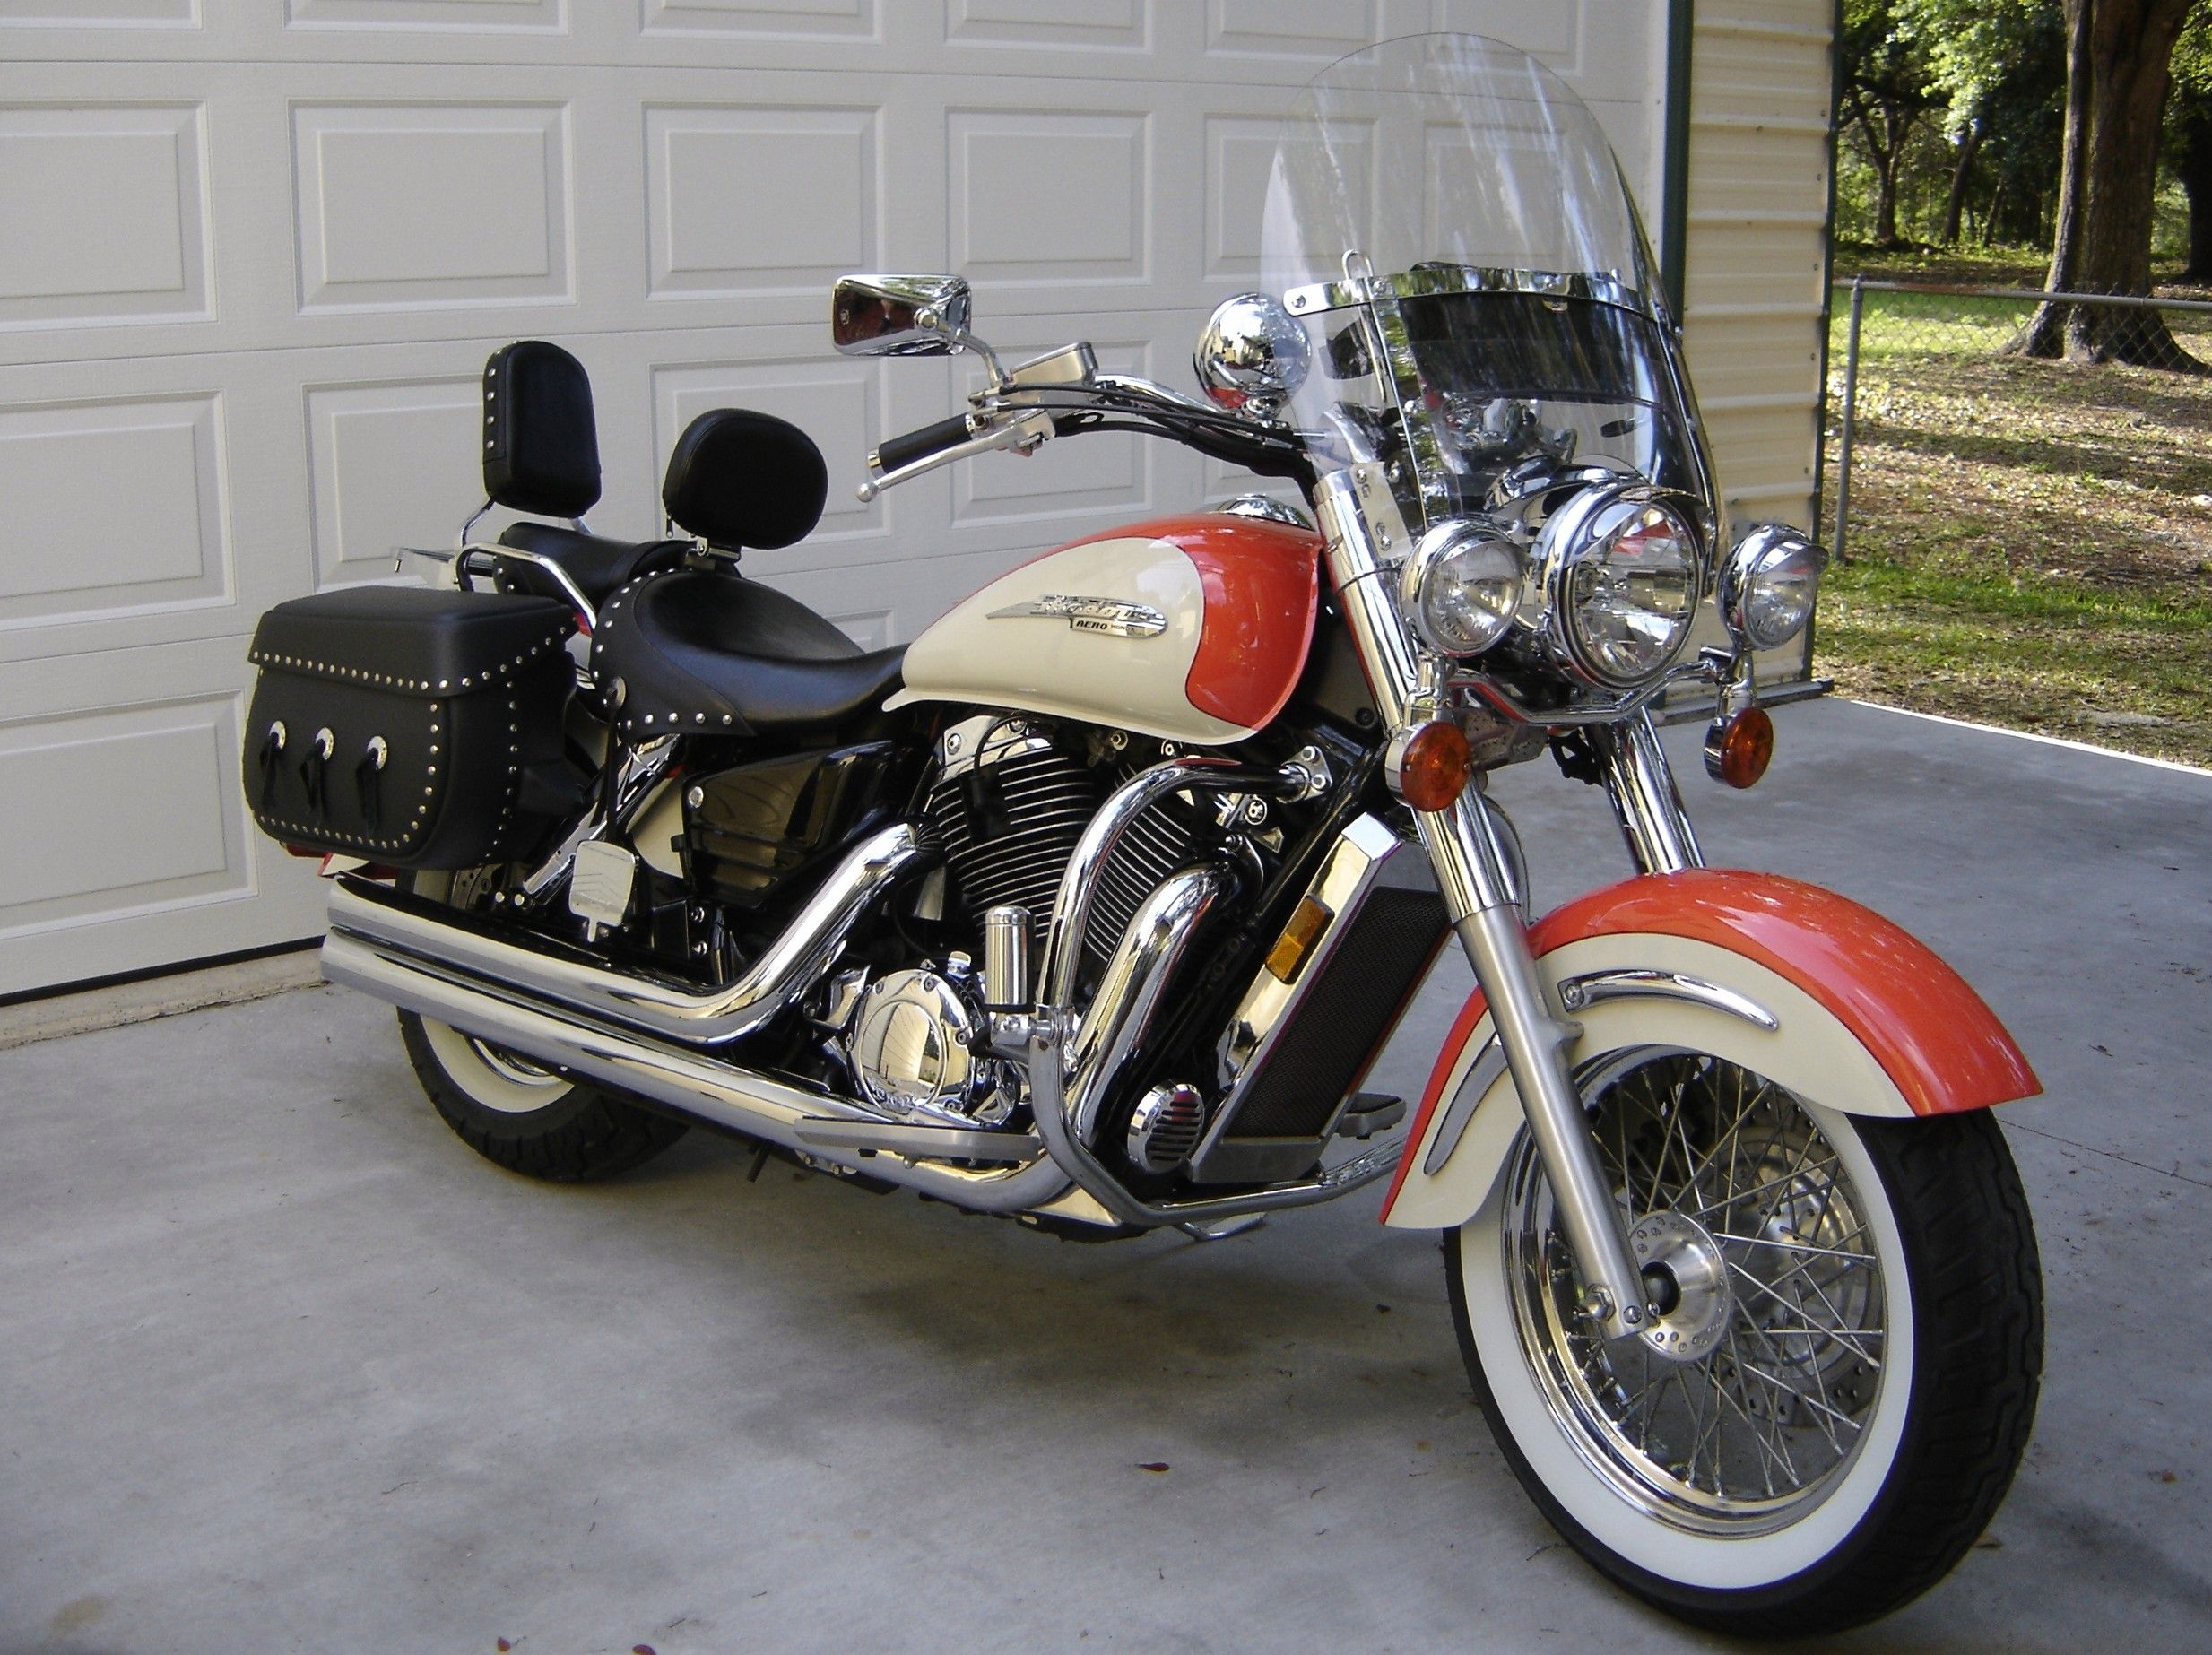 my ride 1999 honda shadow aero 1100 [ 2467 x 1846 Pixel ]